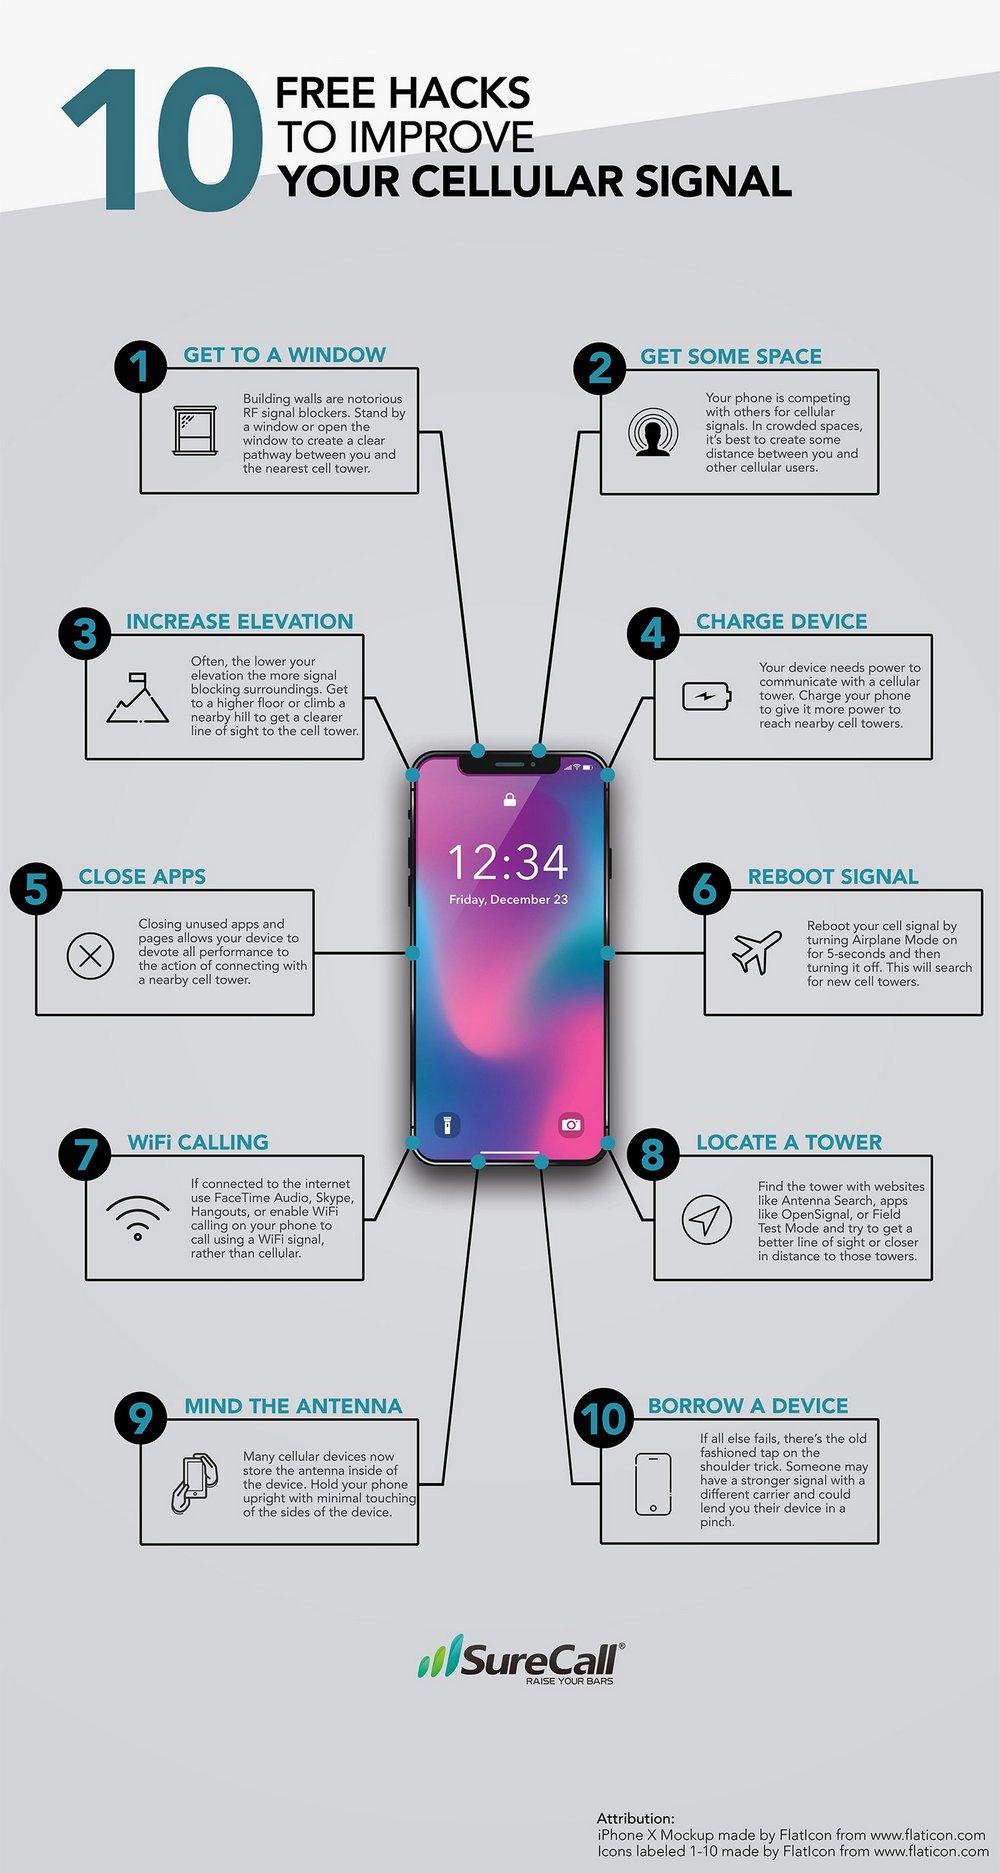 10 gratis hacks om je mobiele signaal te verbeteren